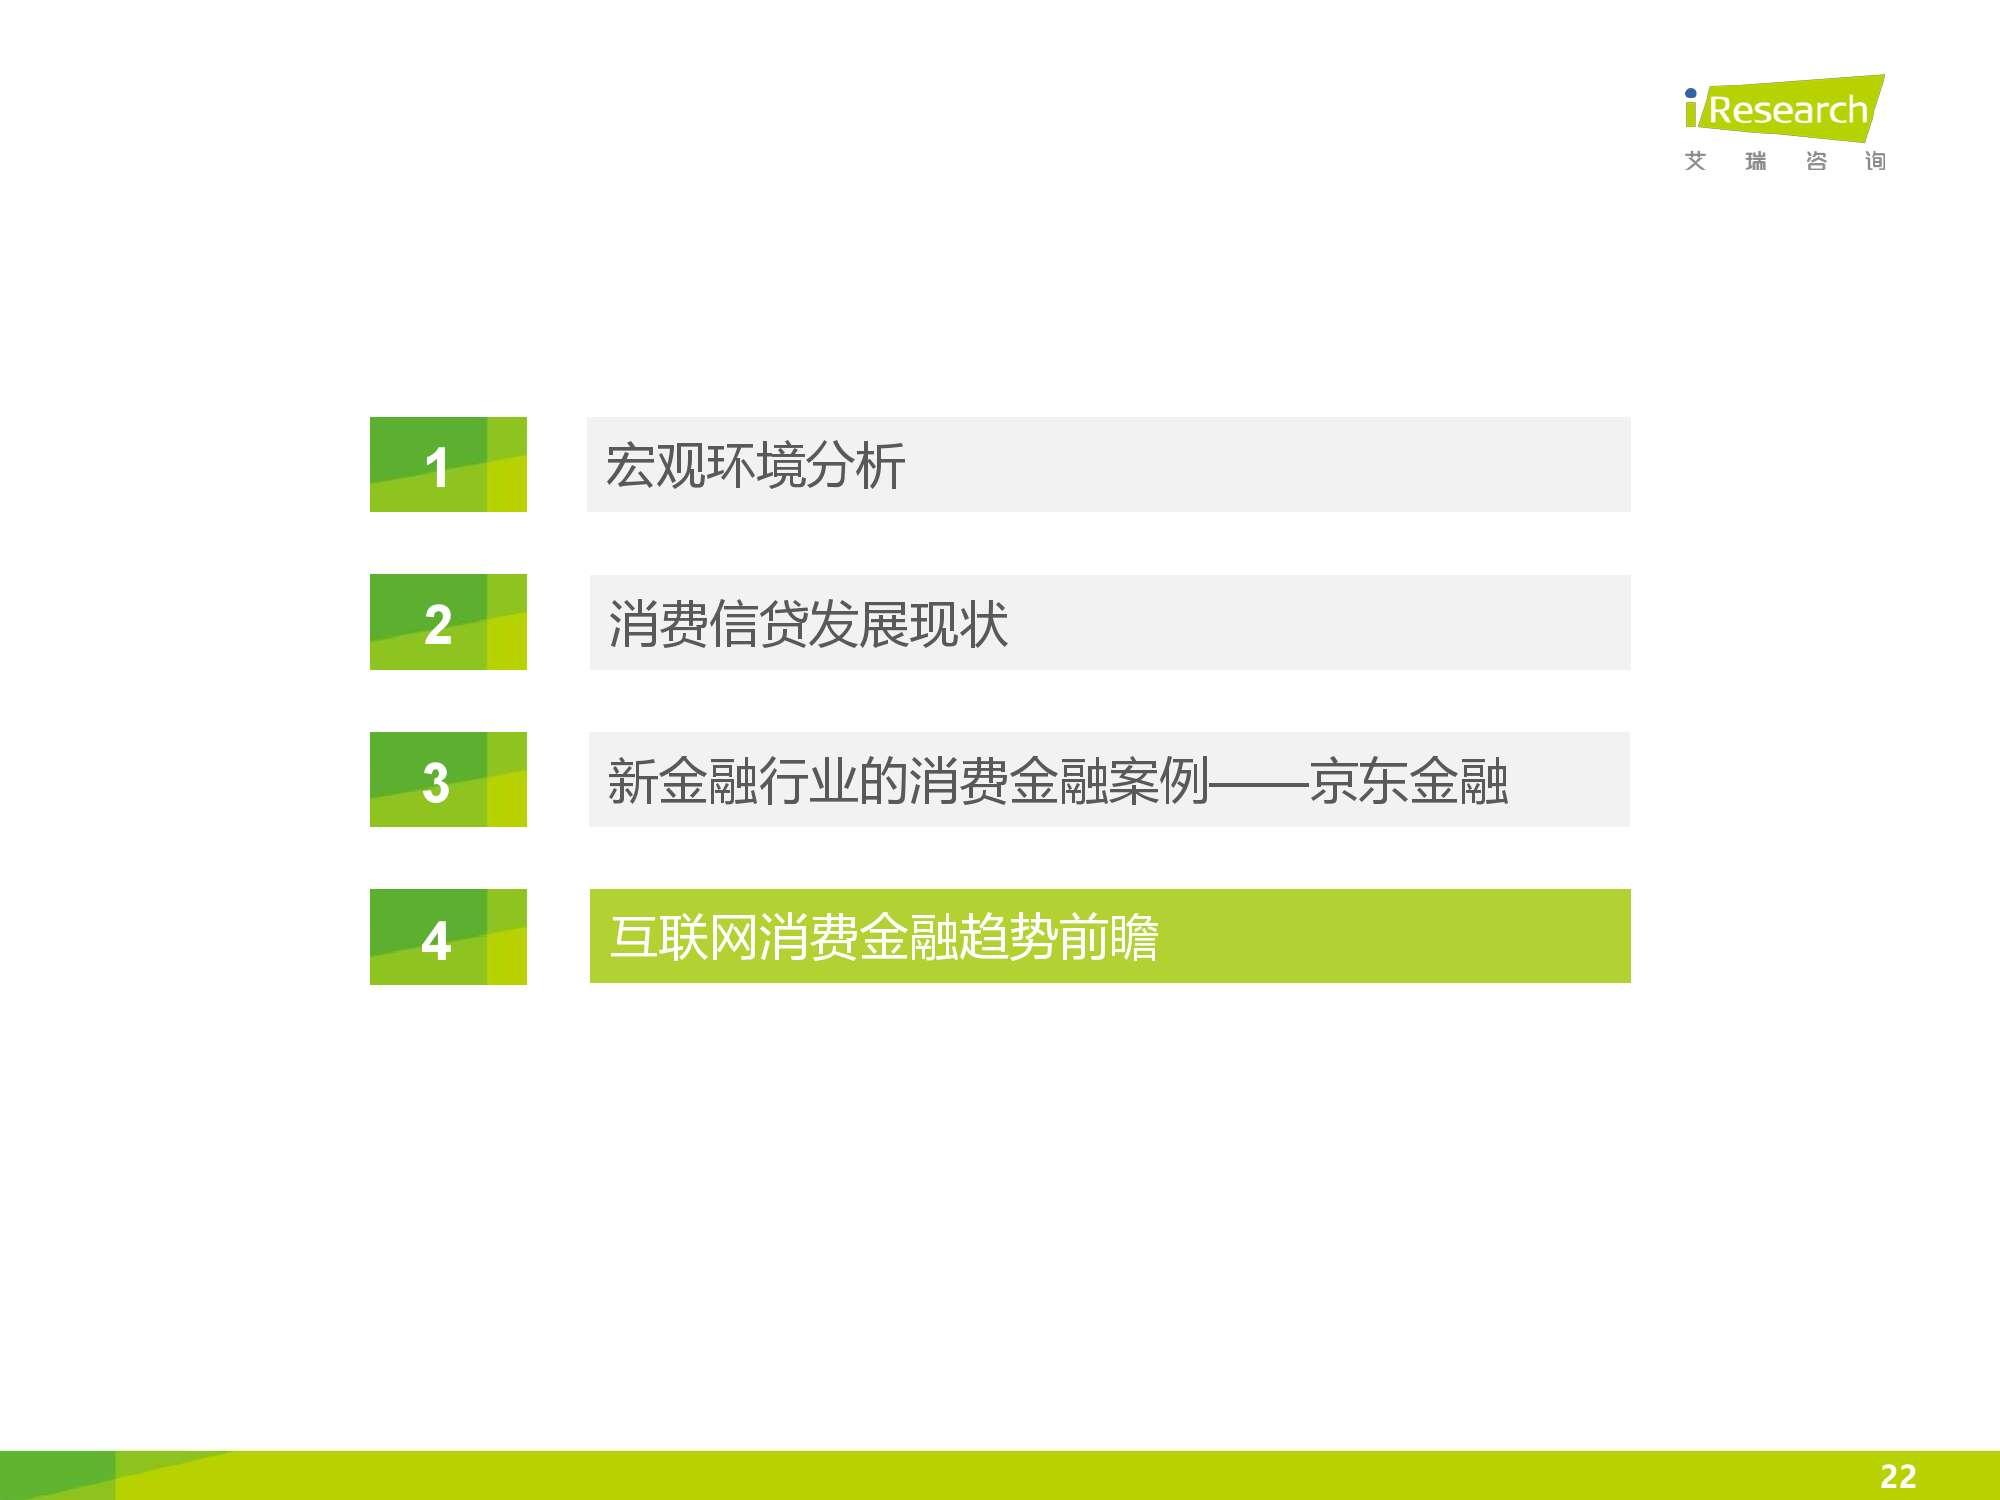 iResearch-2016年中国互联网消费金融市场研究报告_000022